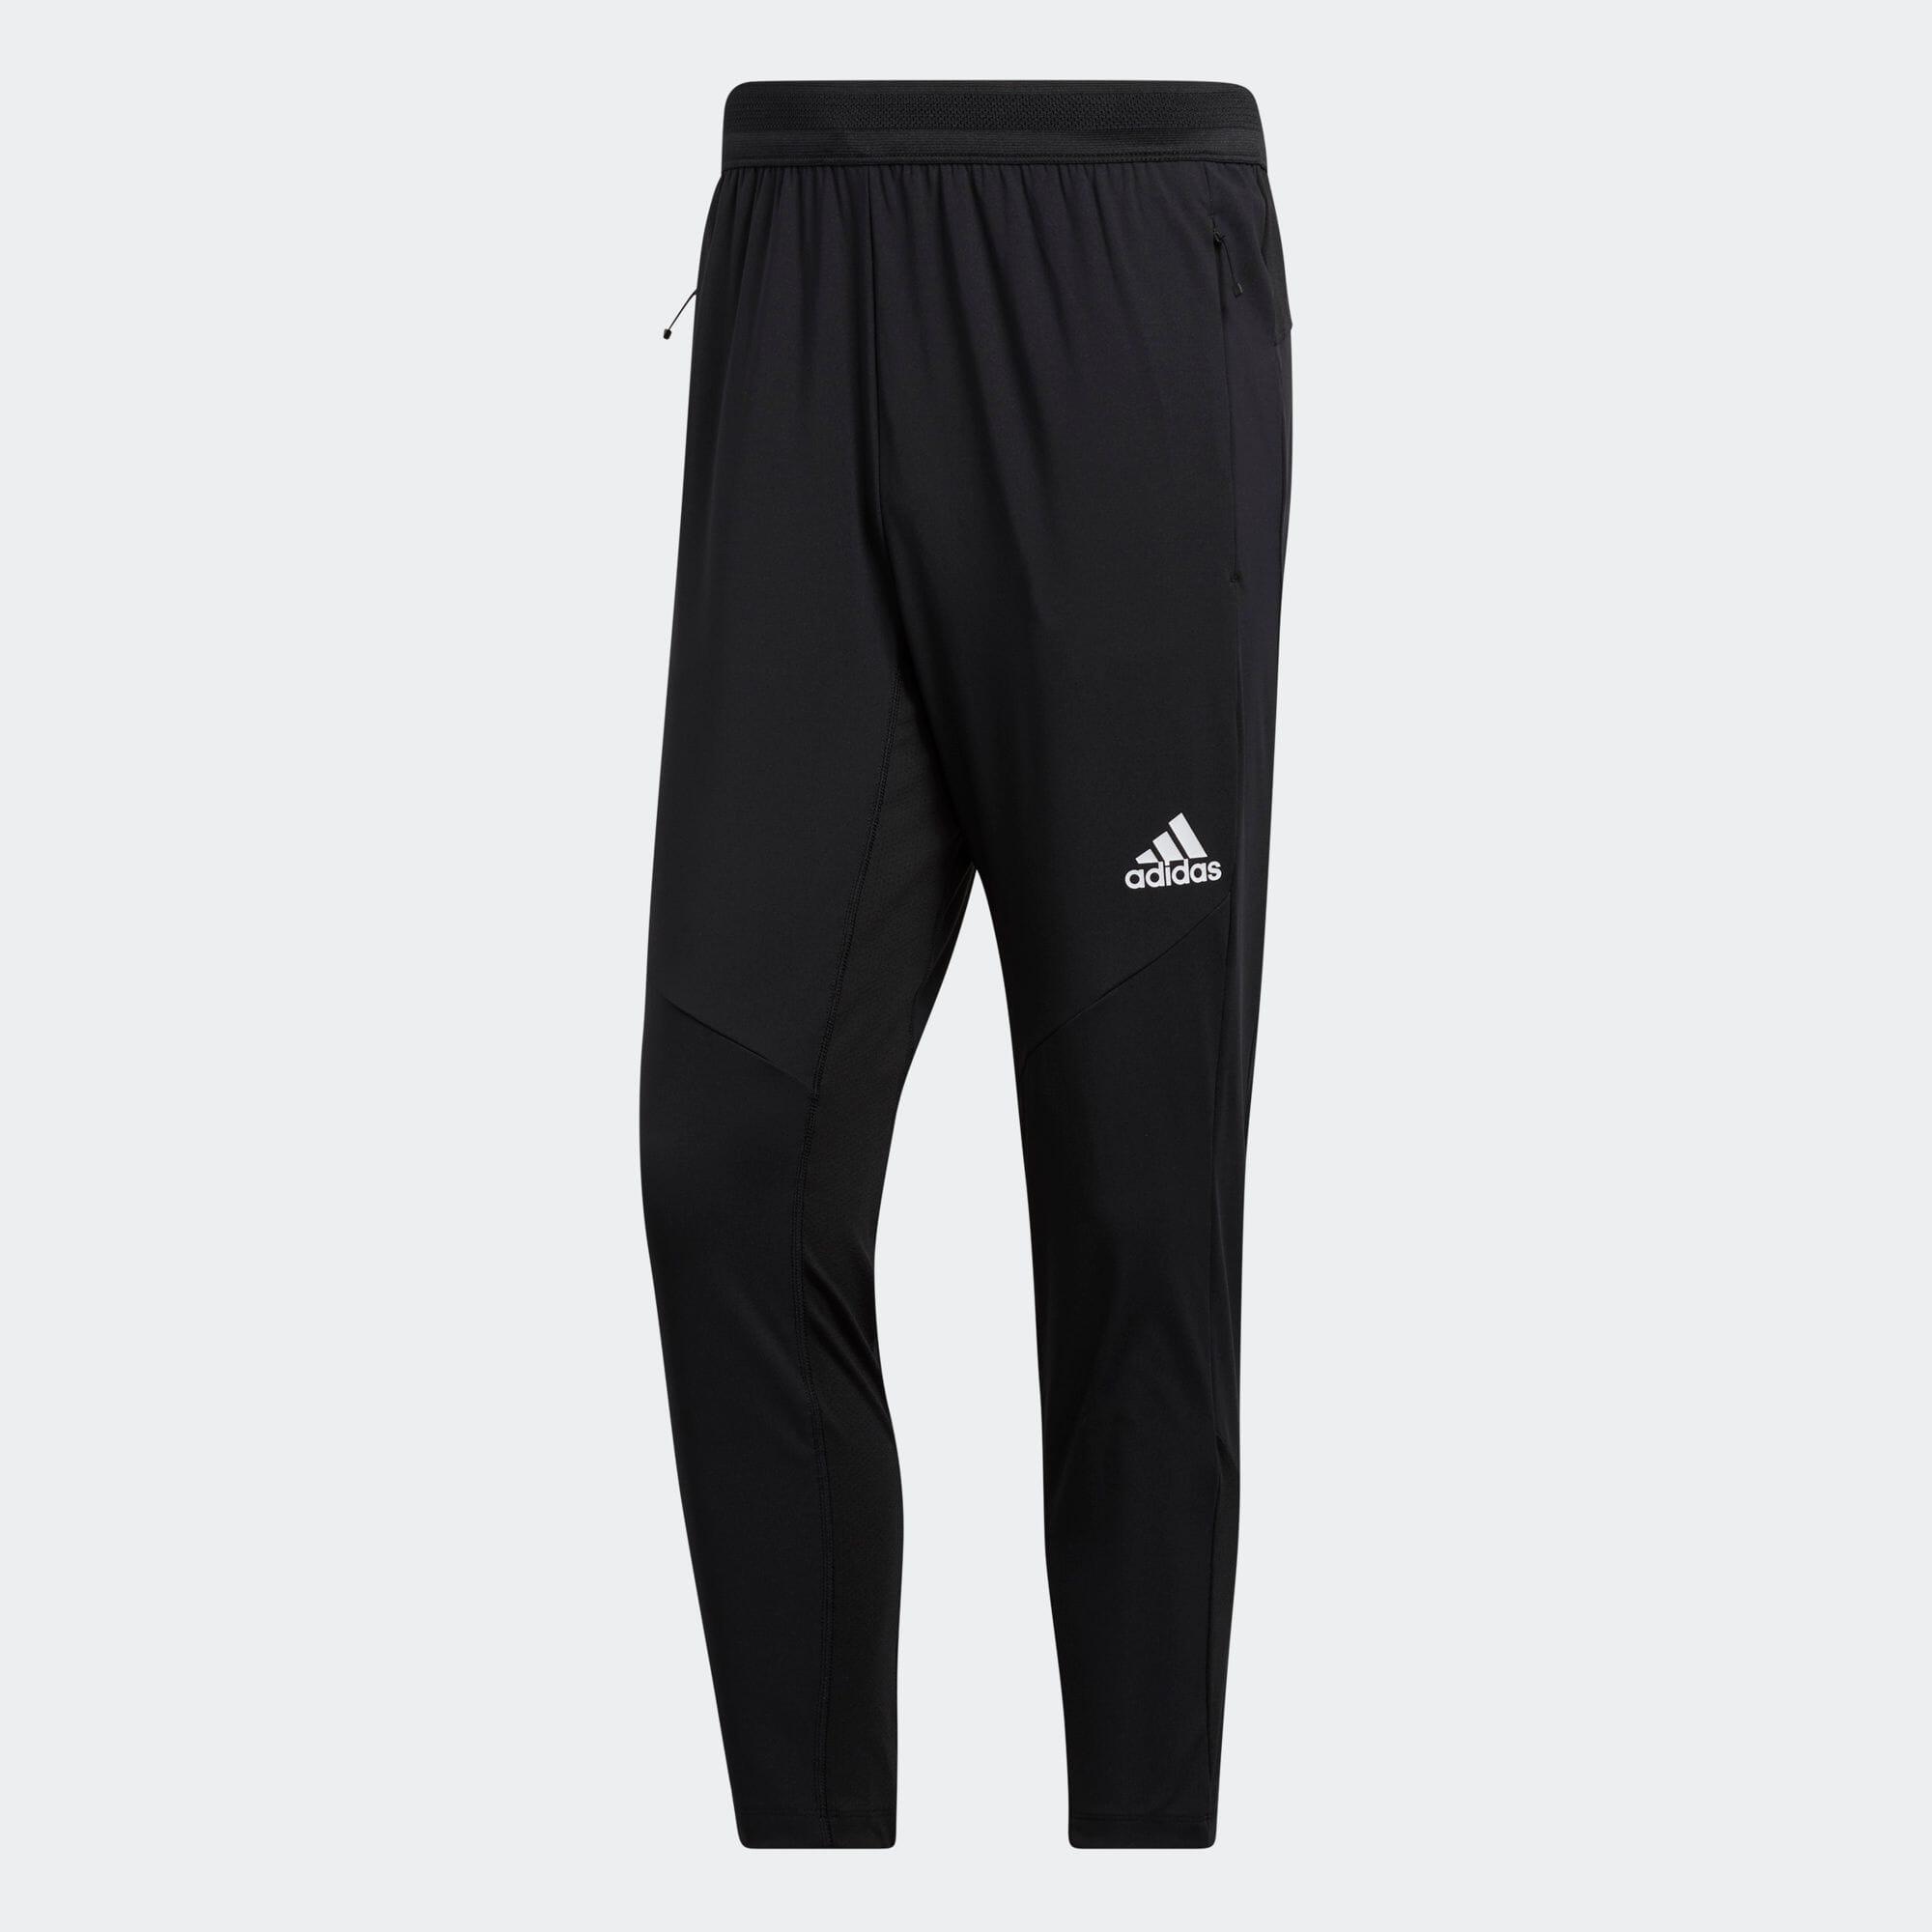 HEAT. RDY 7/8 トレーニングパンツ / HEAT. RDY 7/8 Training Pants